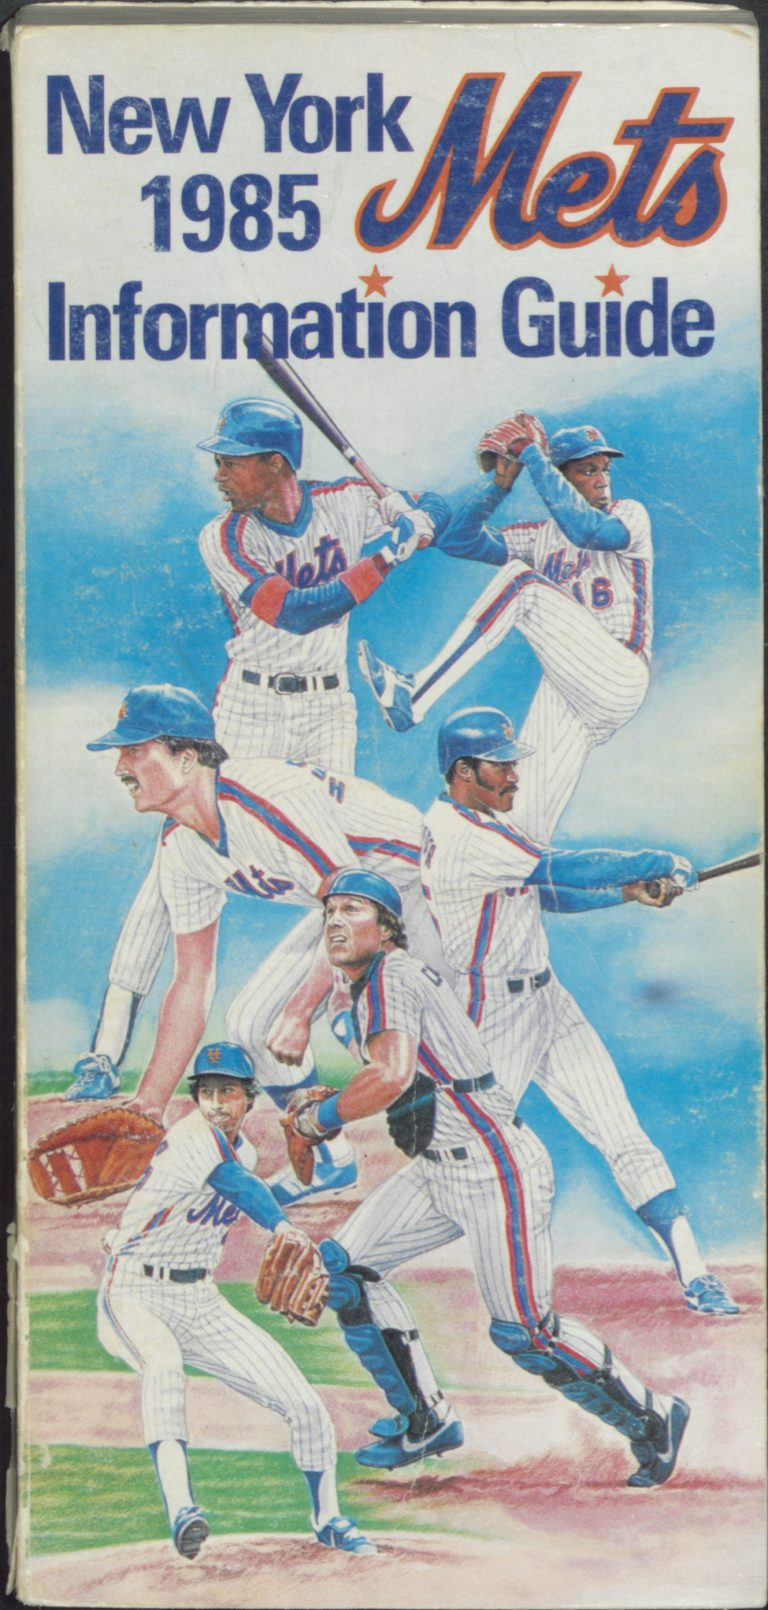 1985 Mets Information Guide: Rising Stars